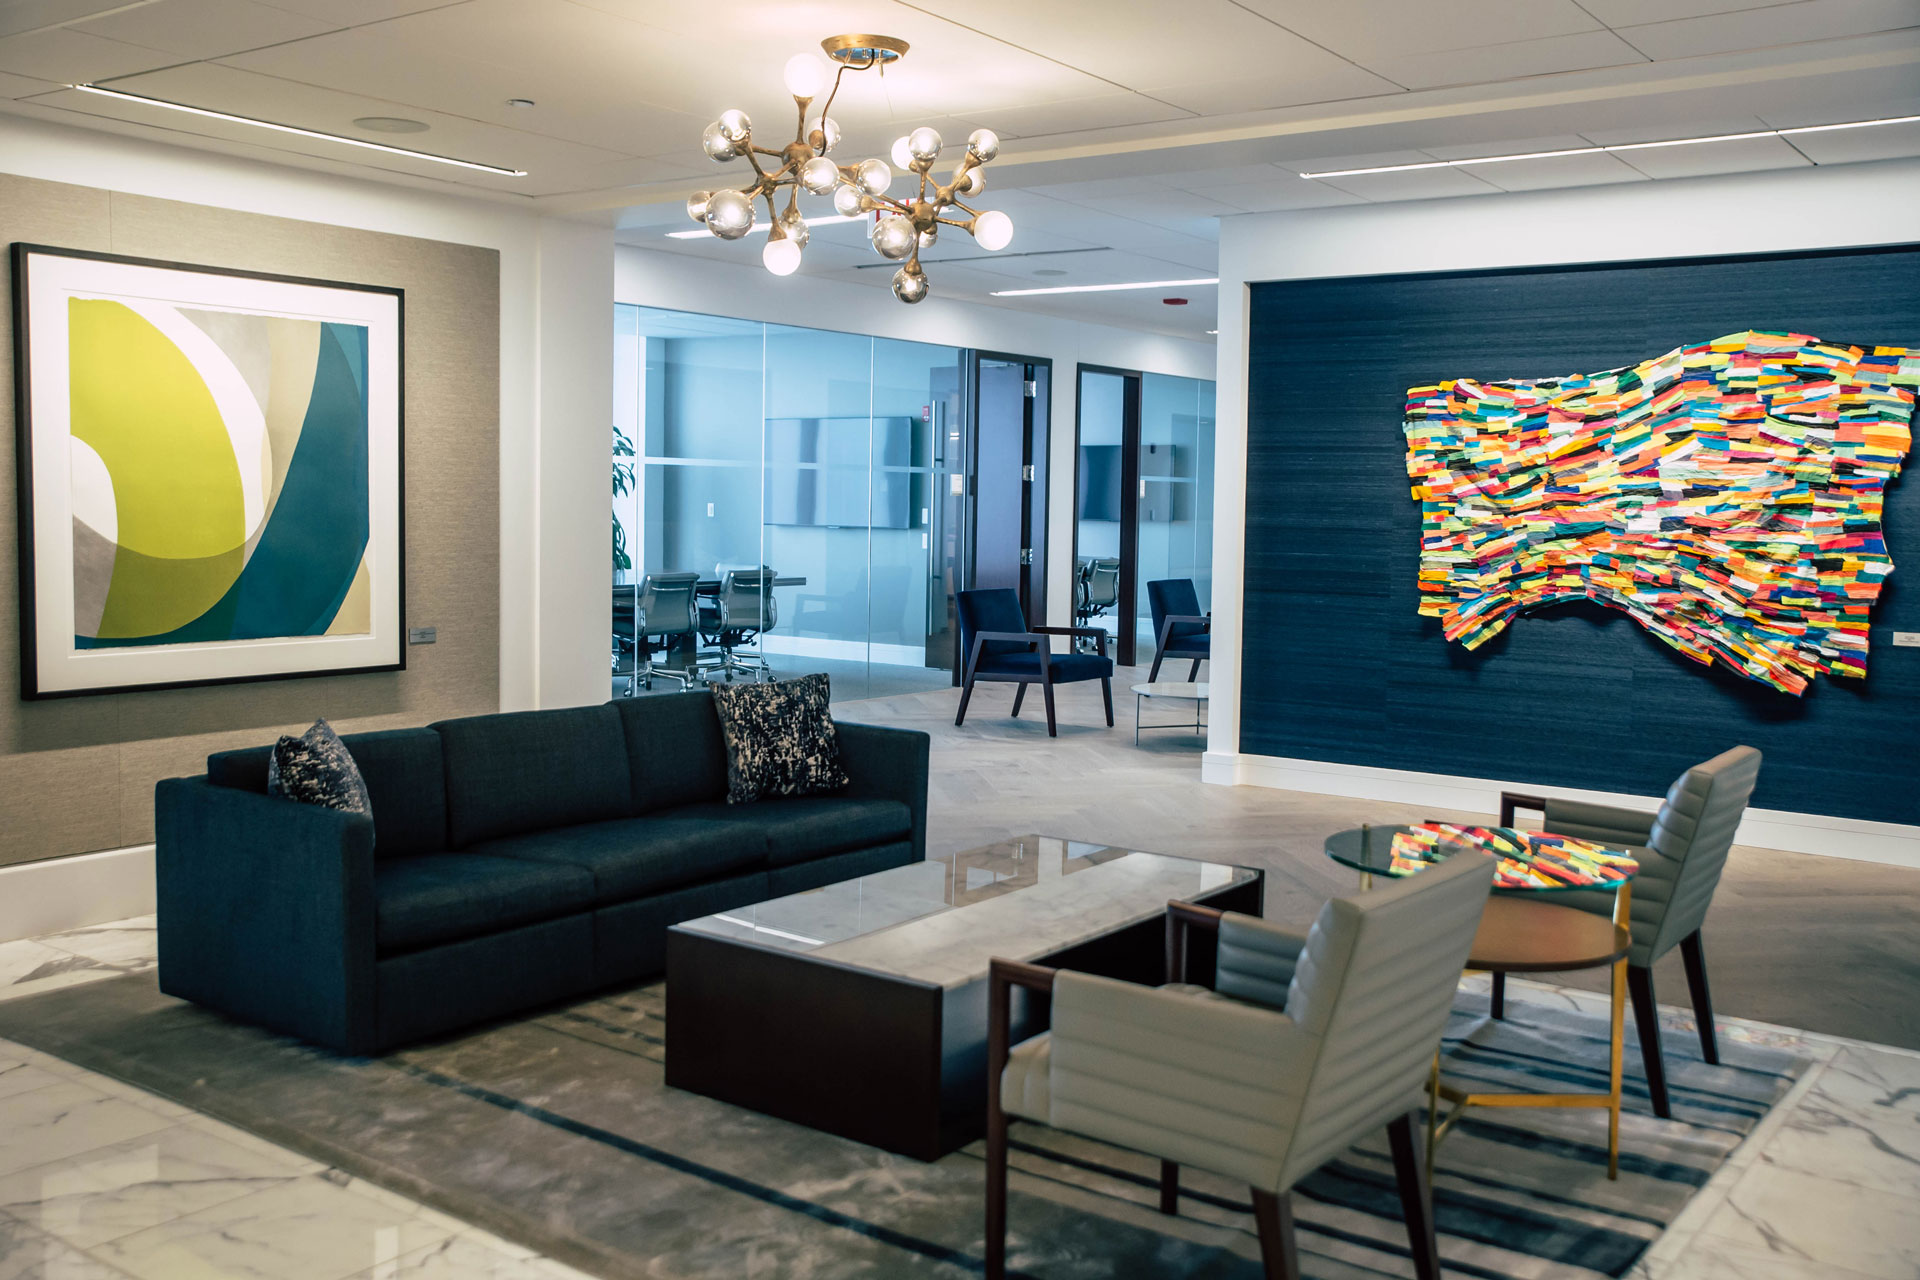 Chicago Business Law Firm | Barnes & Thornburg